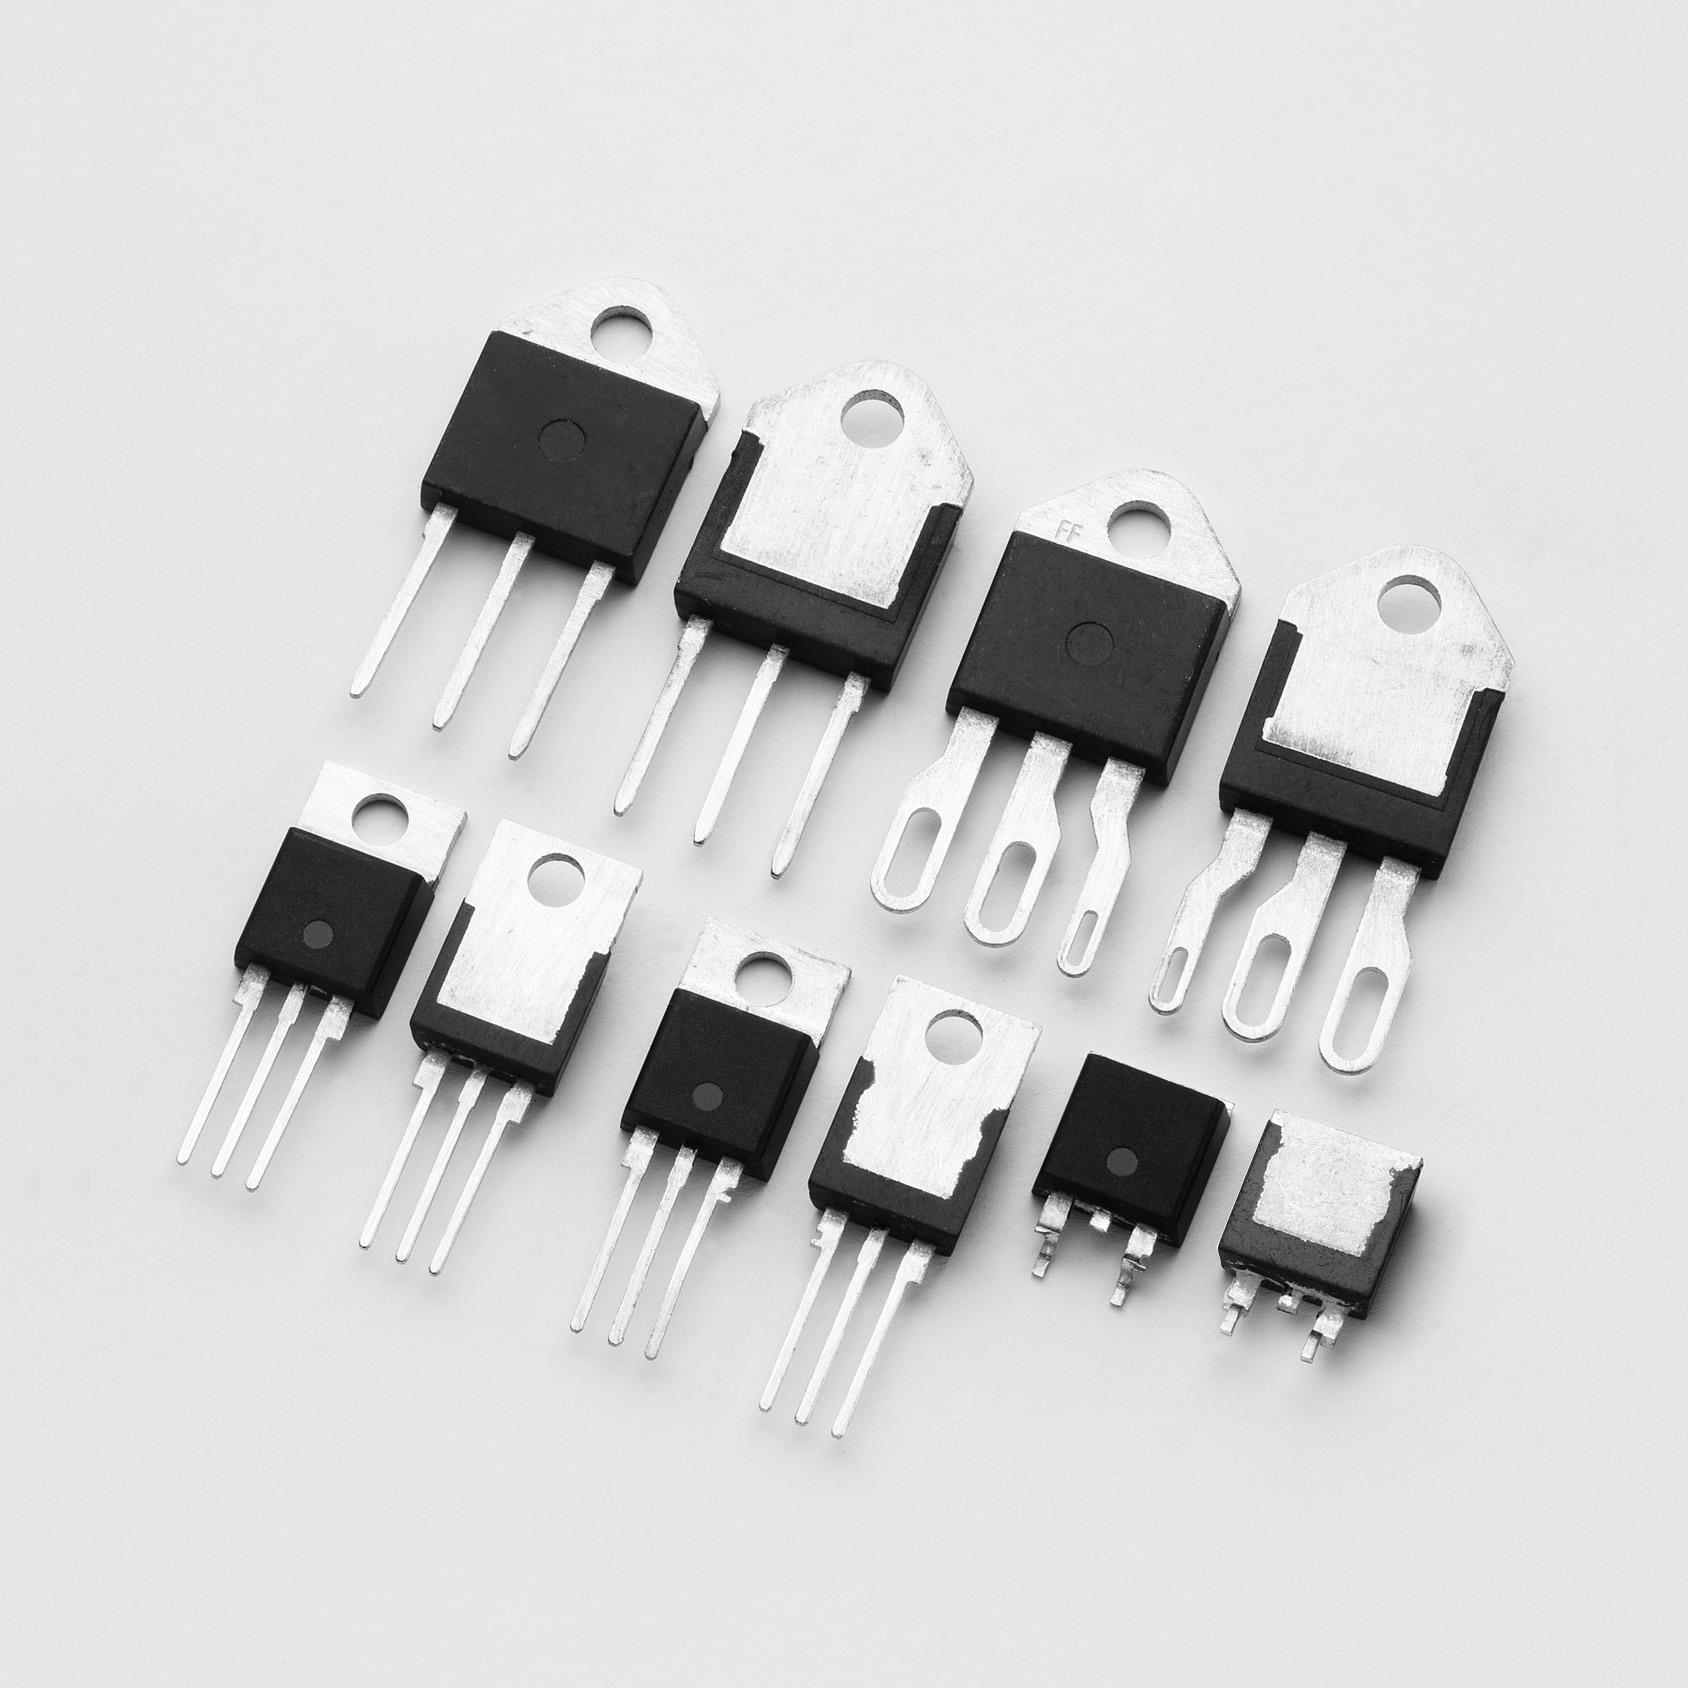 Triac Thyristors Littelfuse Components Gt Passive Fuses Circuit Protection Qjxx25xhx Series